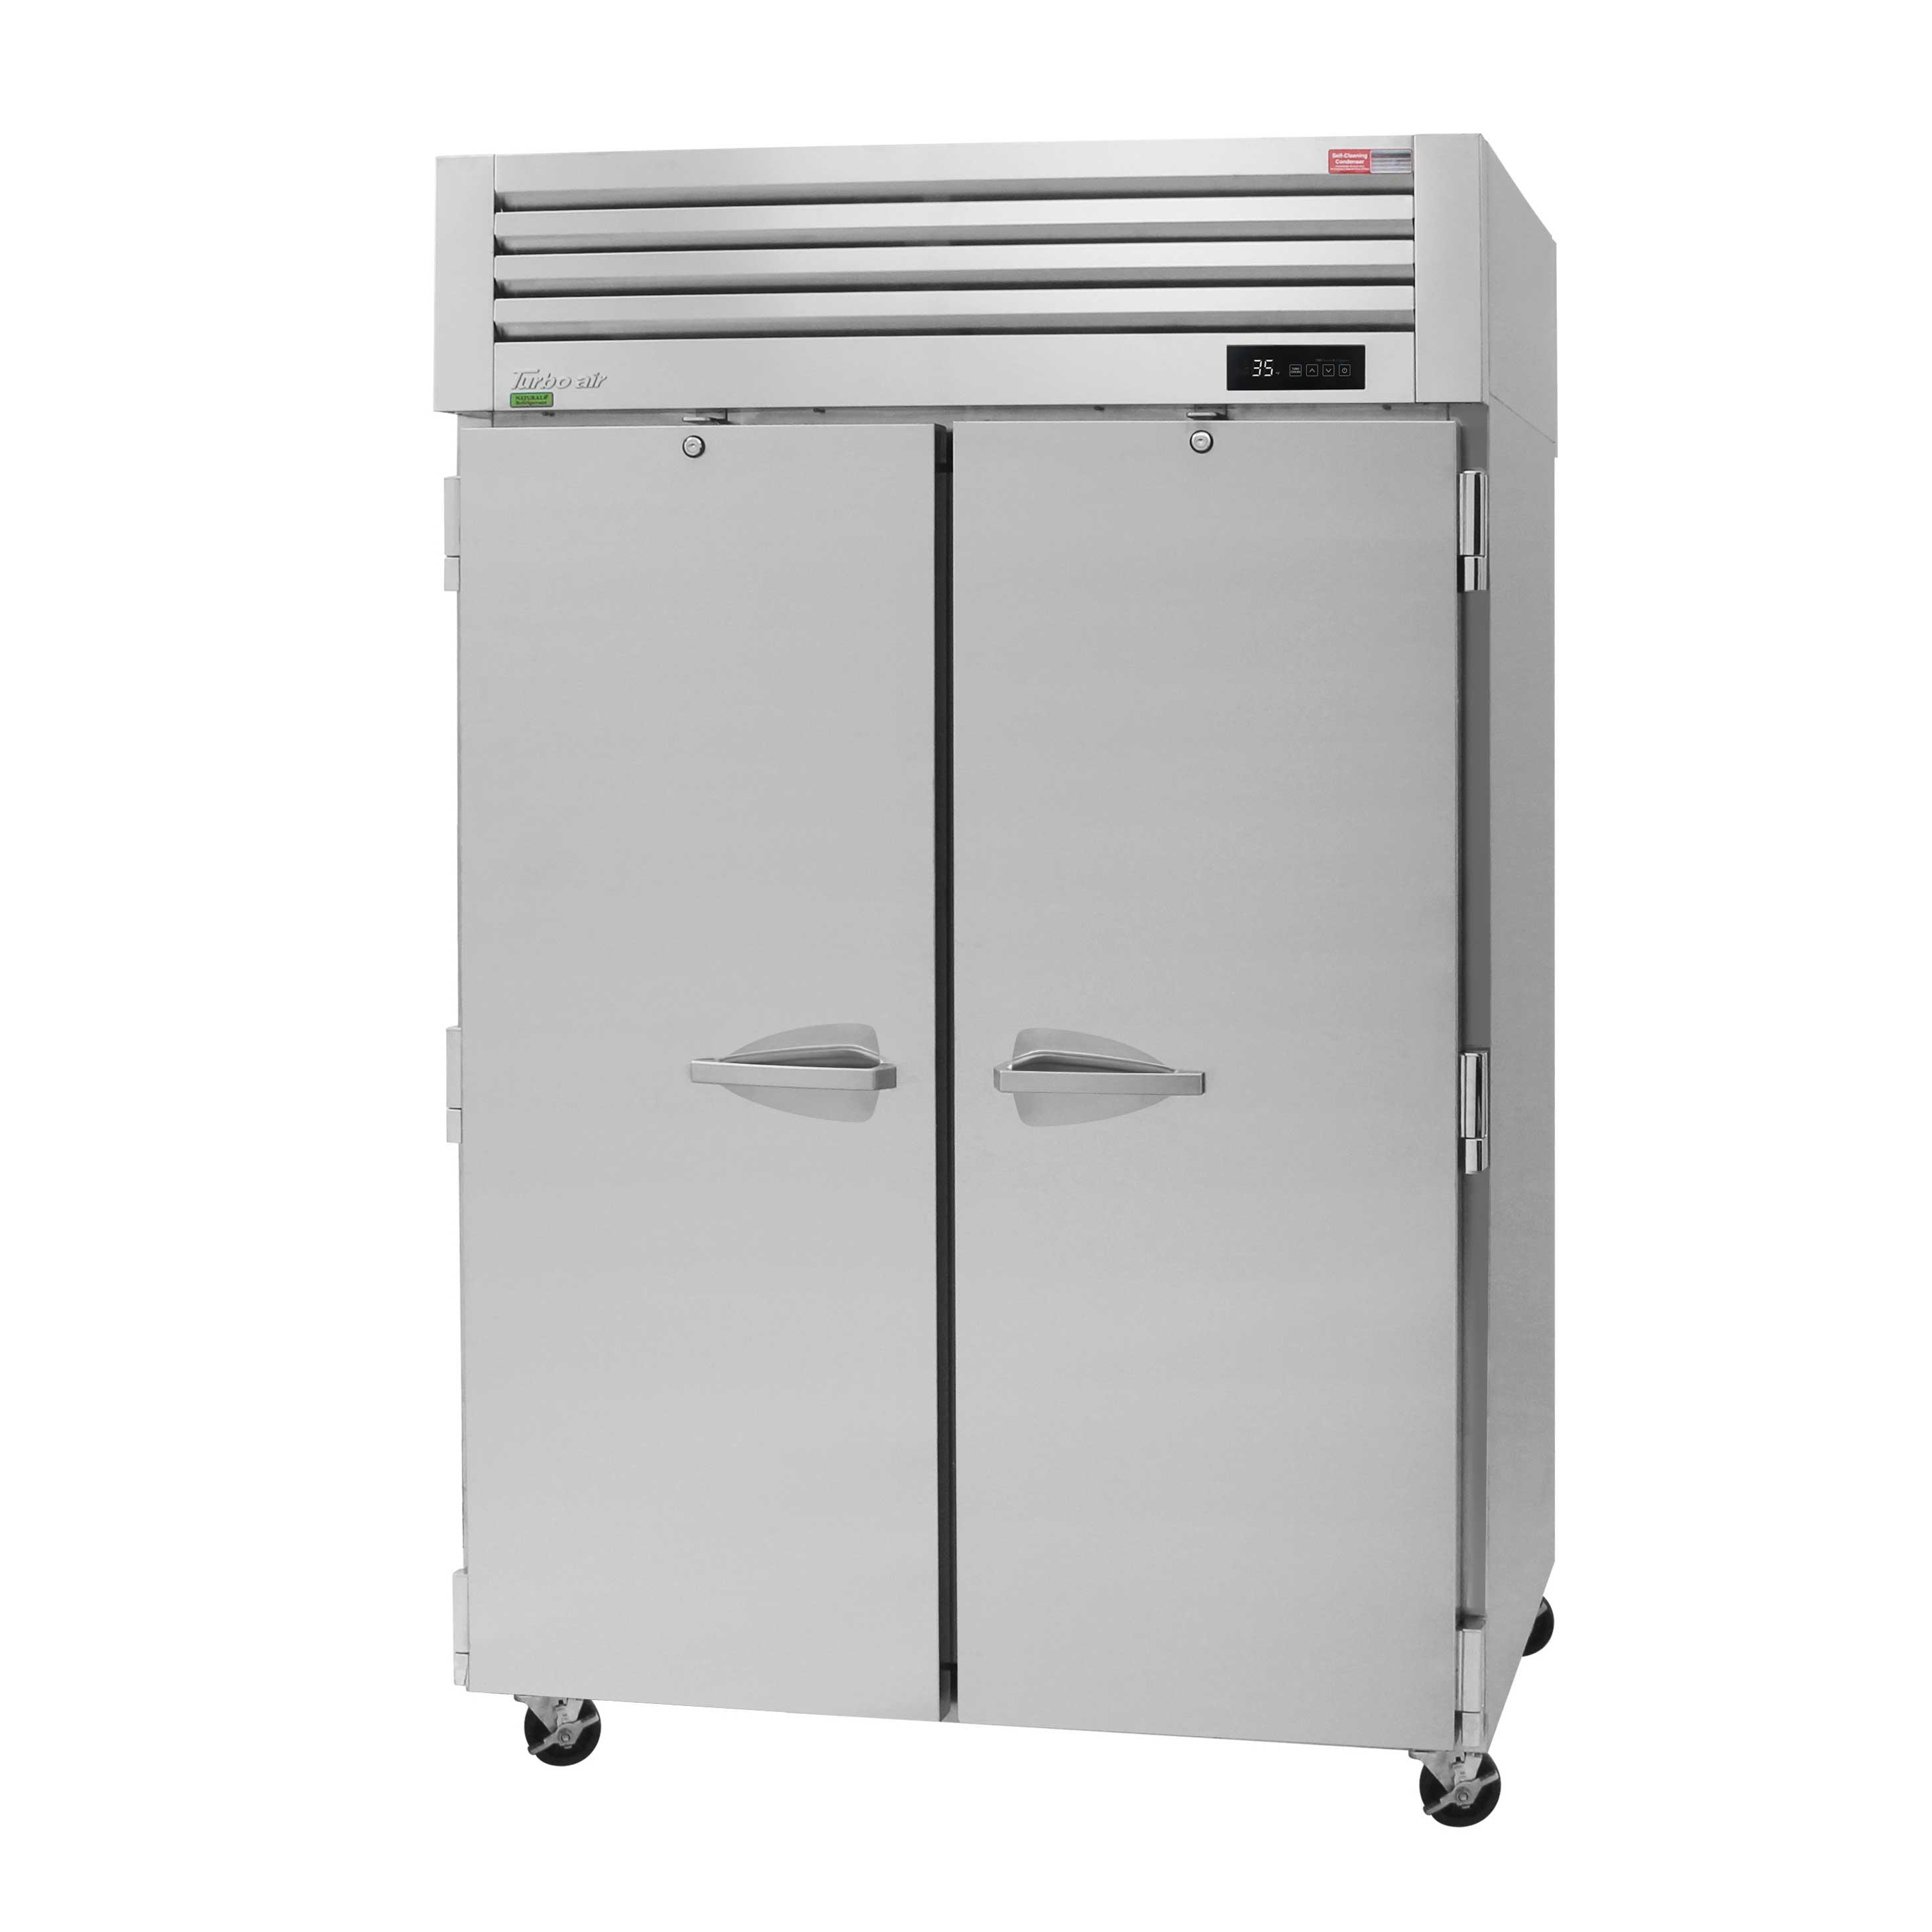 Turbo Air PRO-50R-PT-N refrigerator, pass-thru